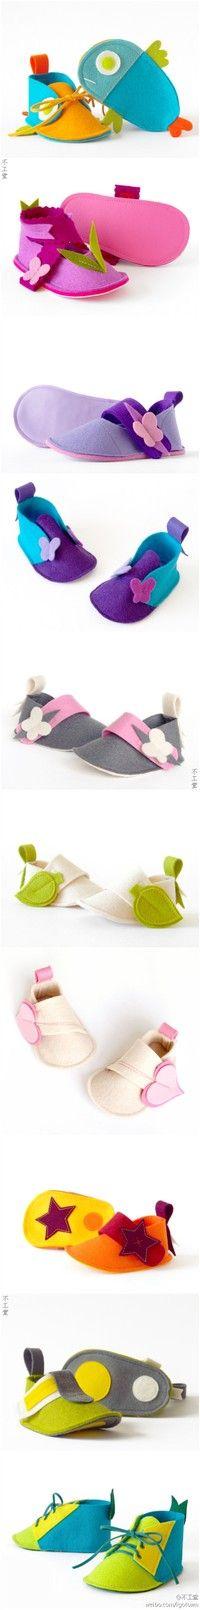 sapatinhos de feltro!